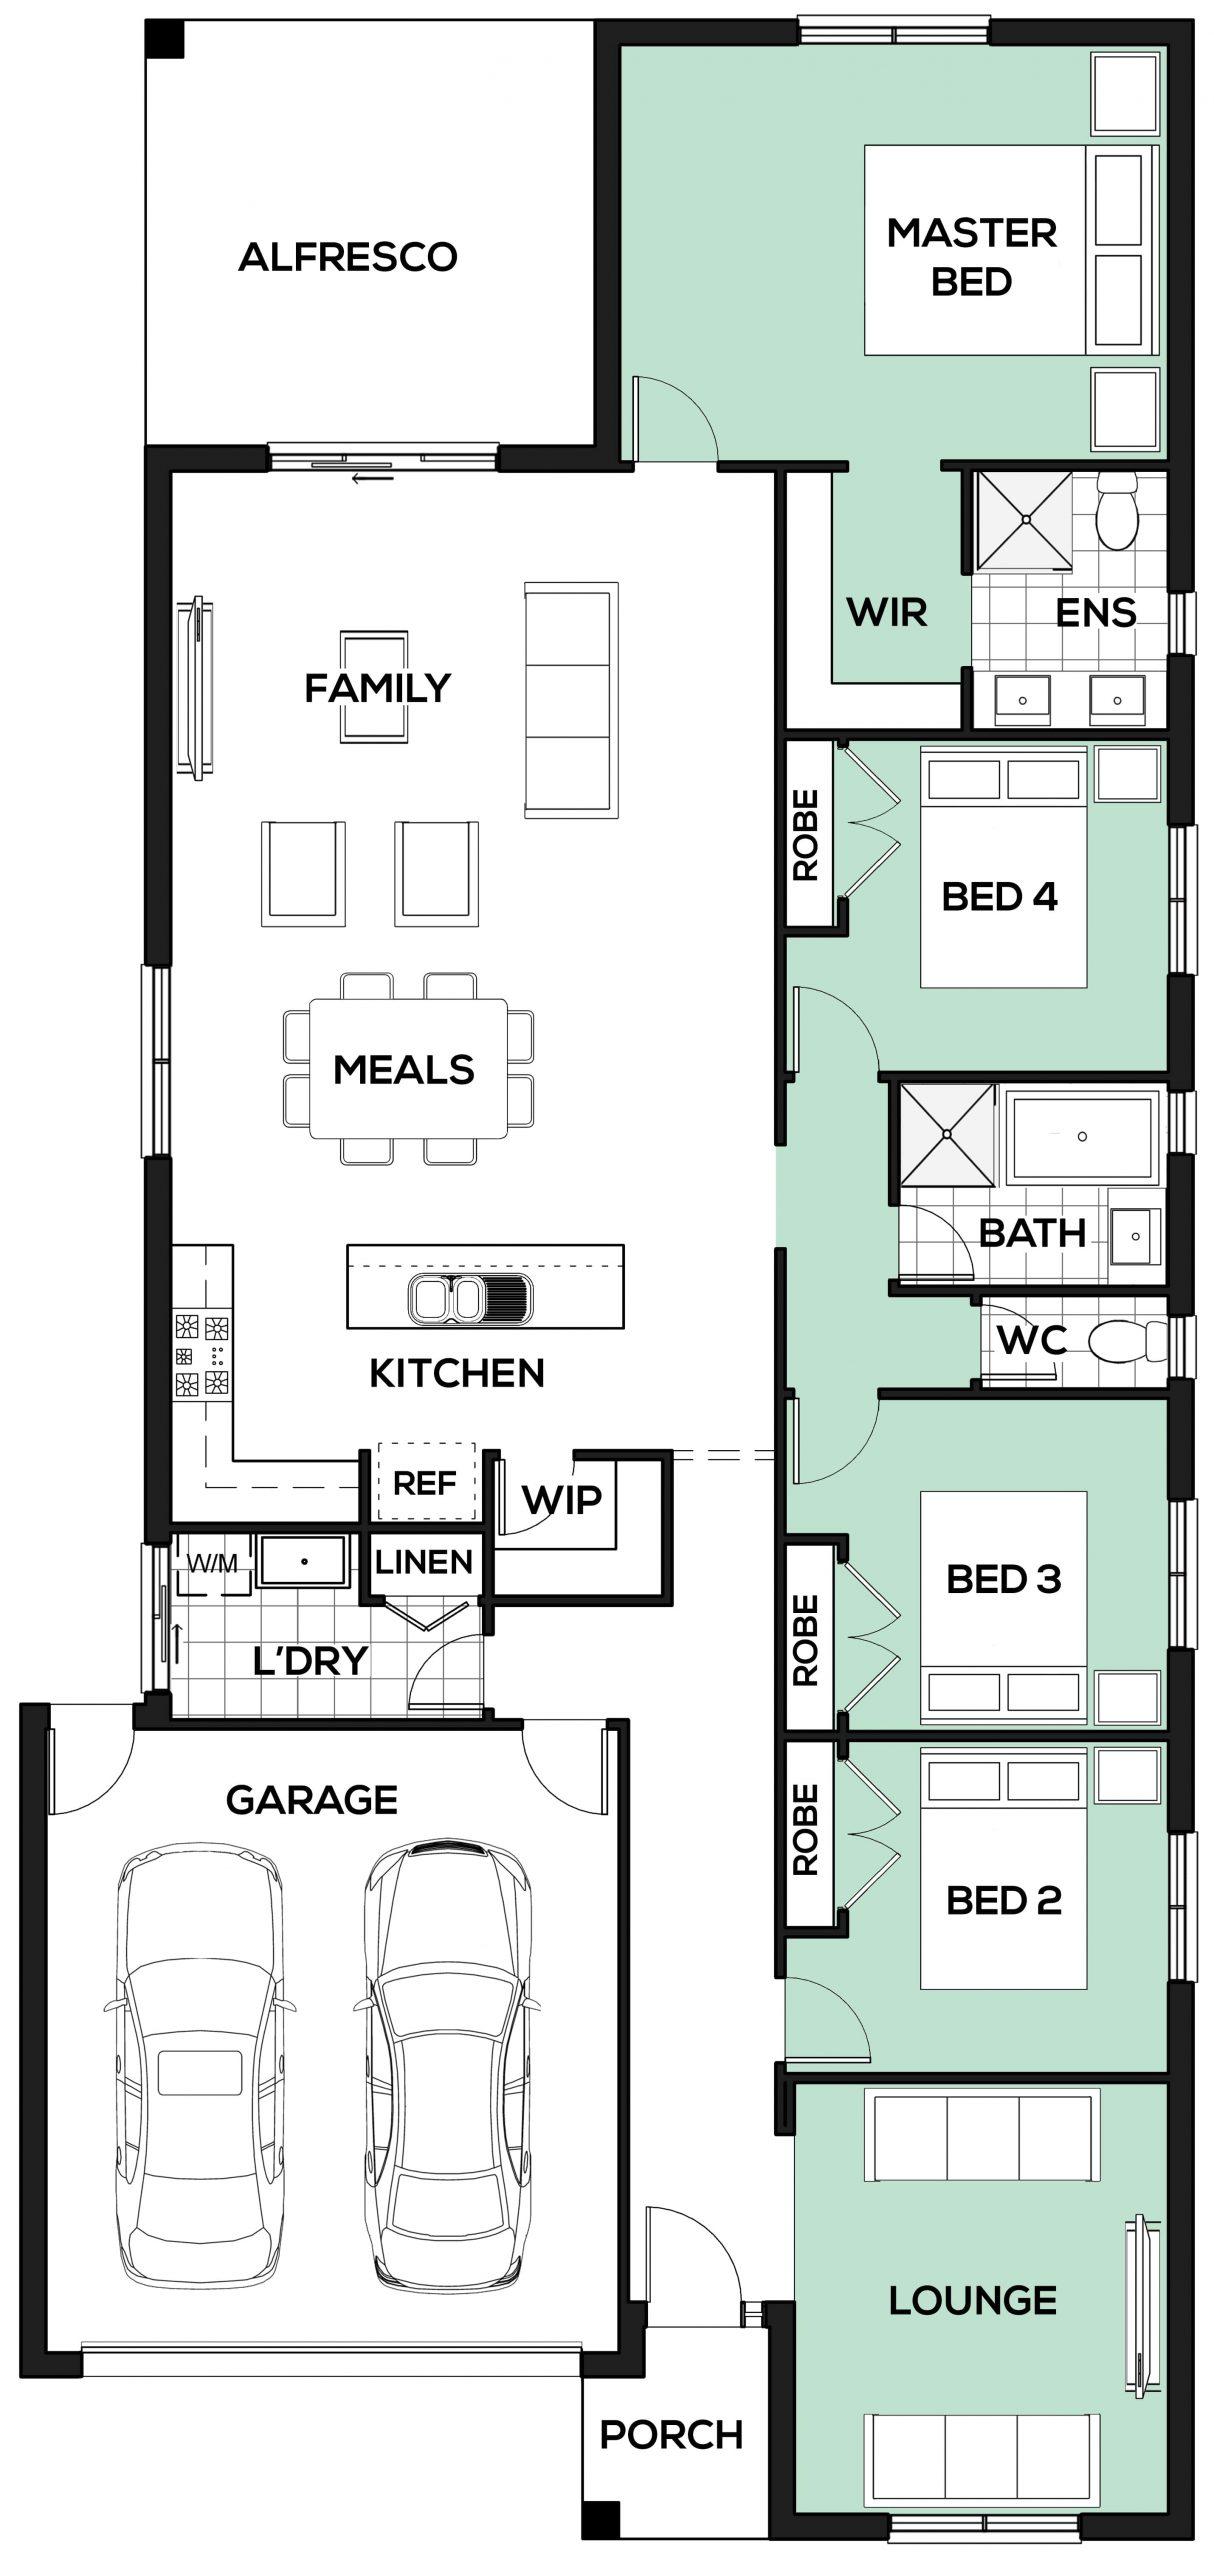 Lot 646 Westbourne Street, Melton